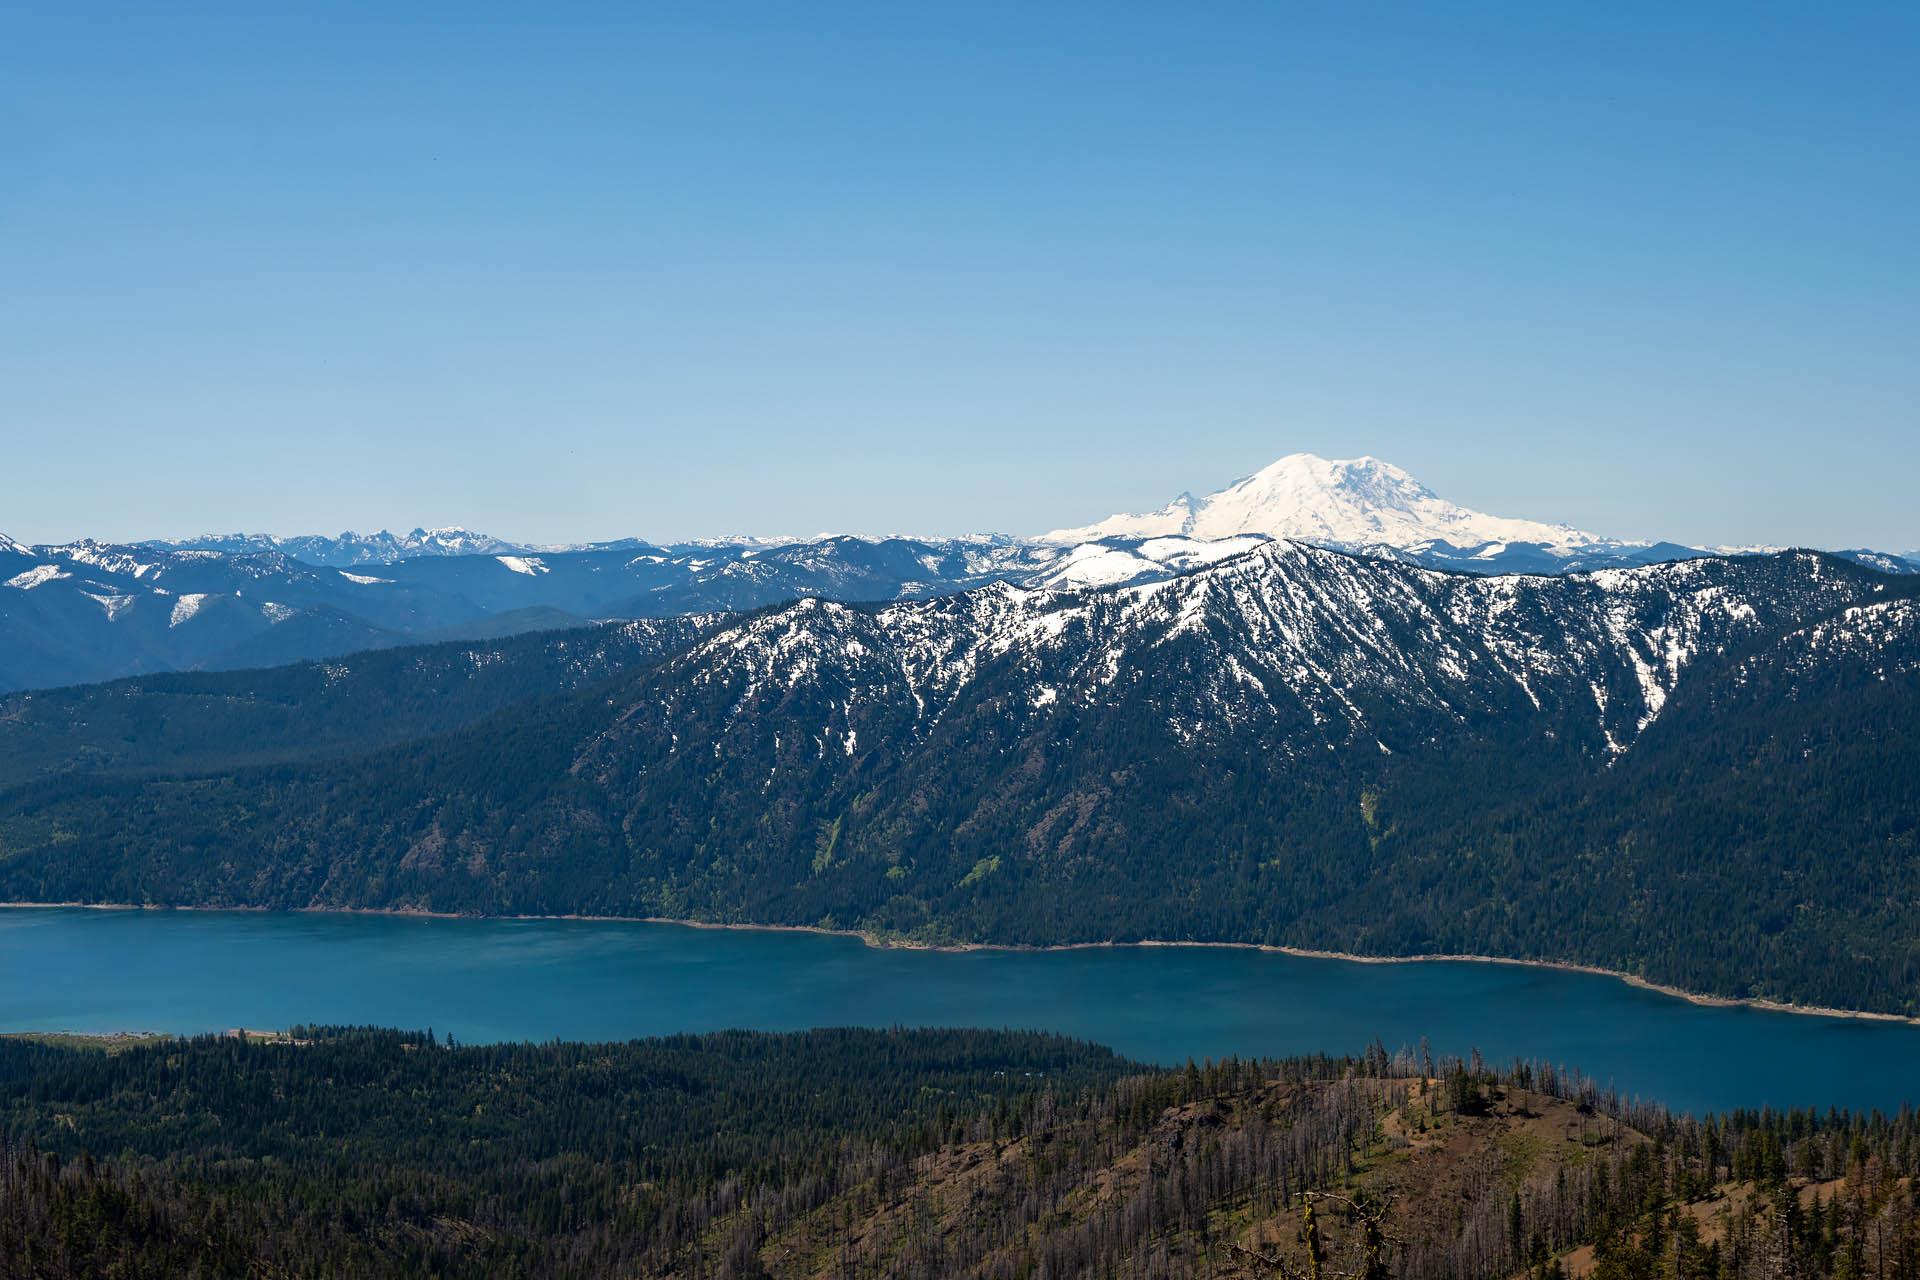 Cle Elum Lake, Mt. Rainier